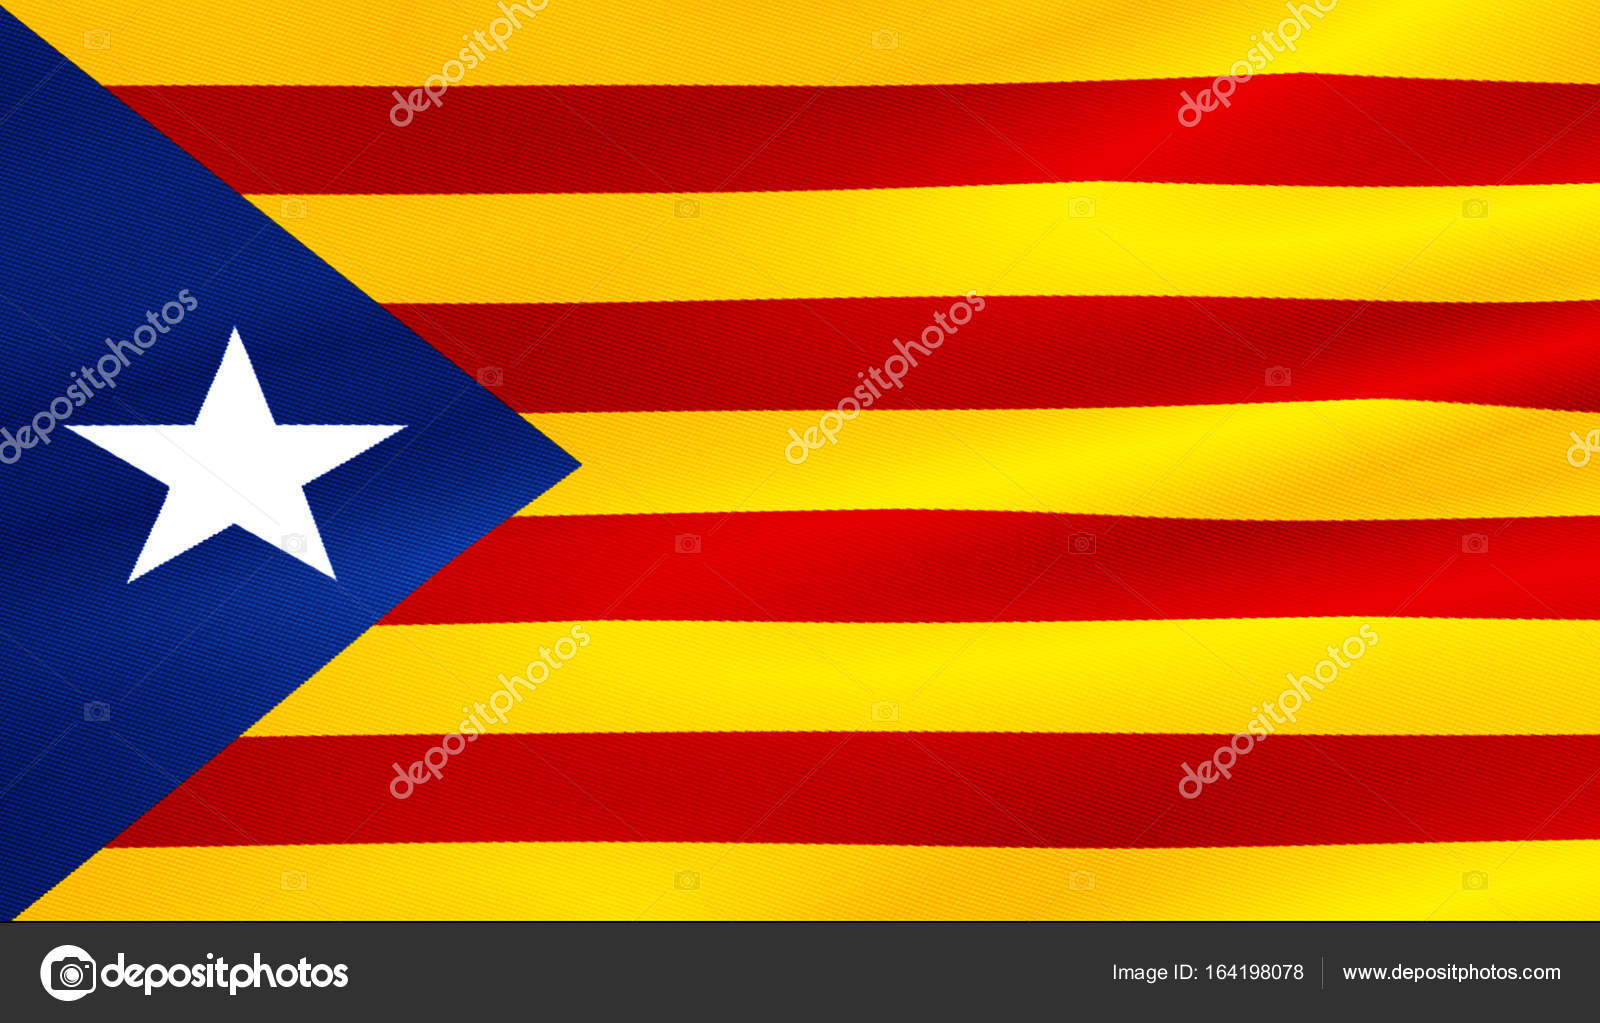 bandera roja azul amarilla horizontal